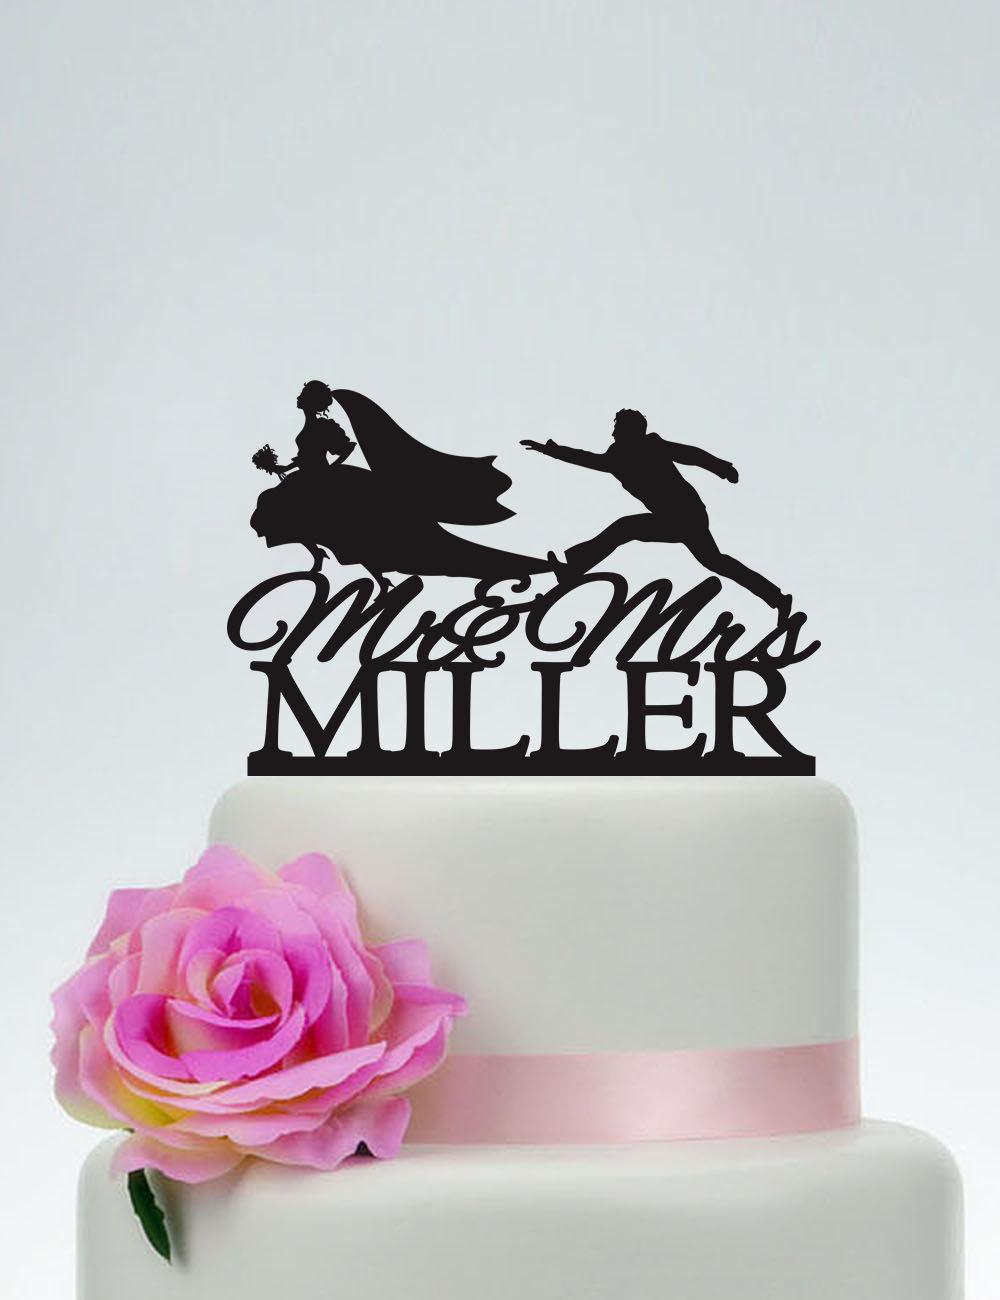 Bride & Groom Running Cake Topper, Runaway Bride, Funny Wedding Topper, Cake Topper With Last Name, Custom Mr Mrs C157